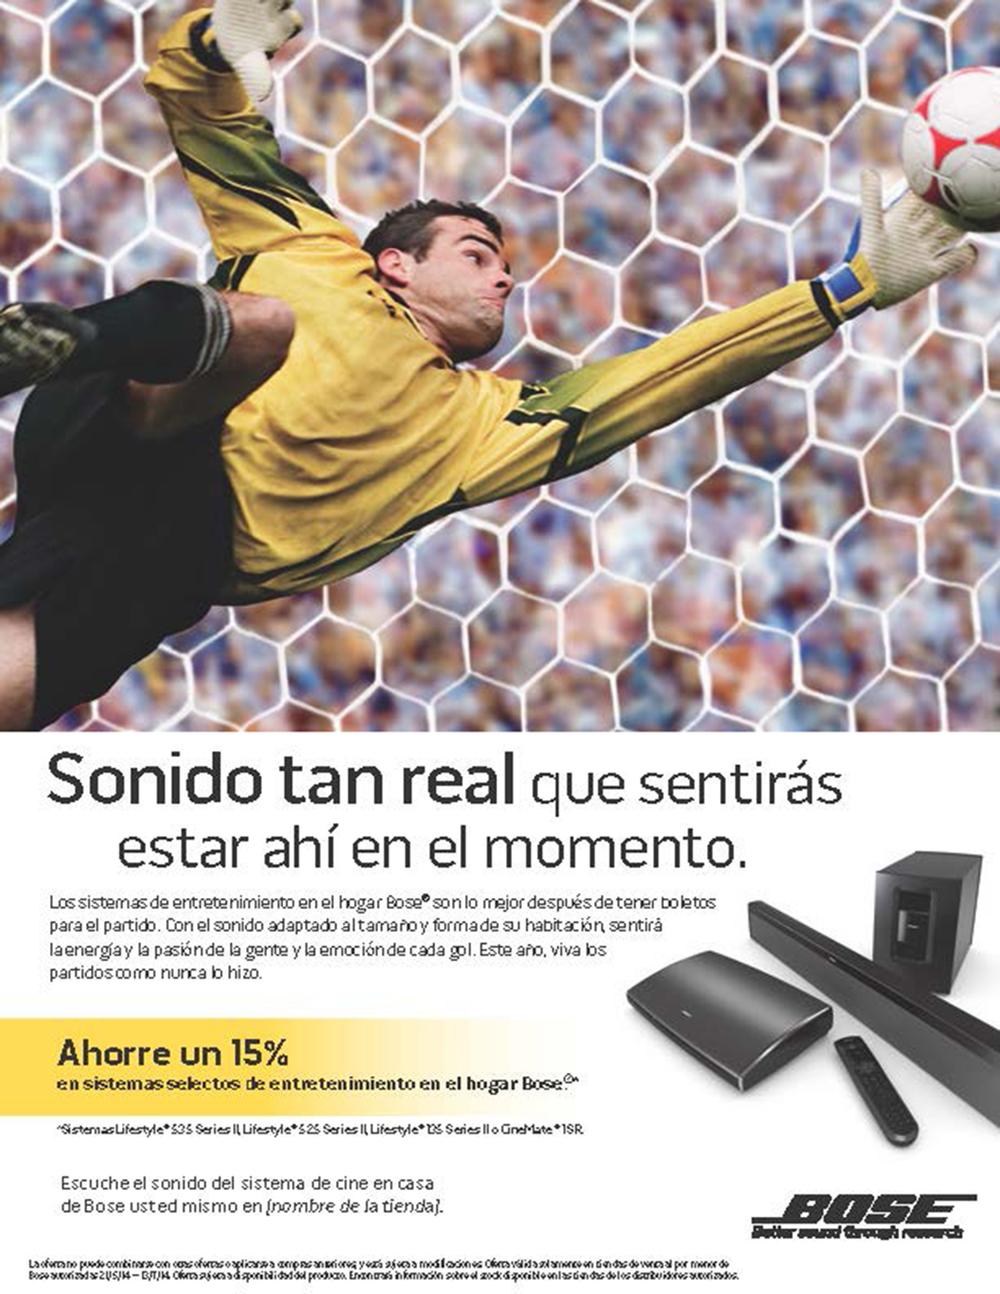 World_Cup_Latin_Ad_1.jpg